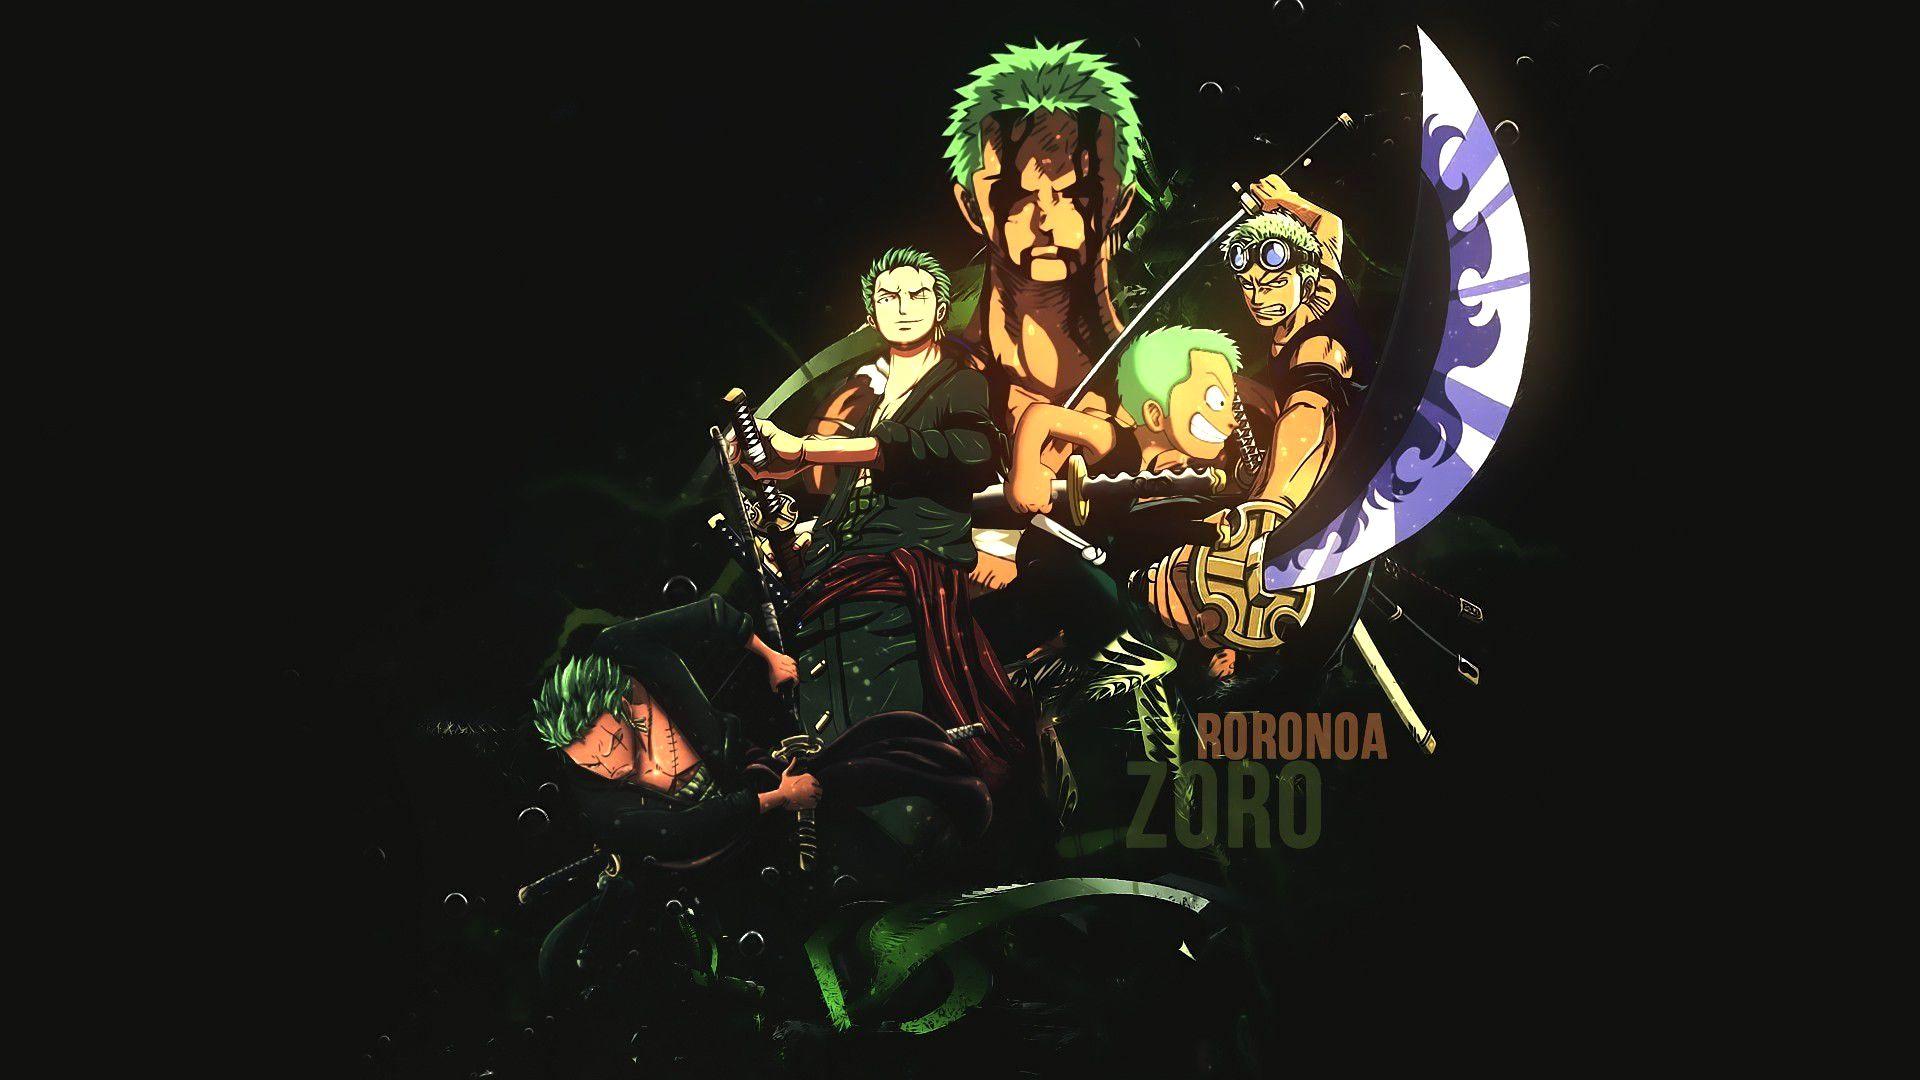 Wallpaper 4K Zoro Trick